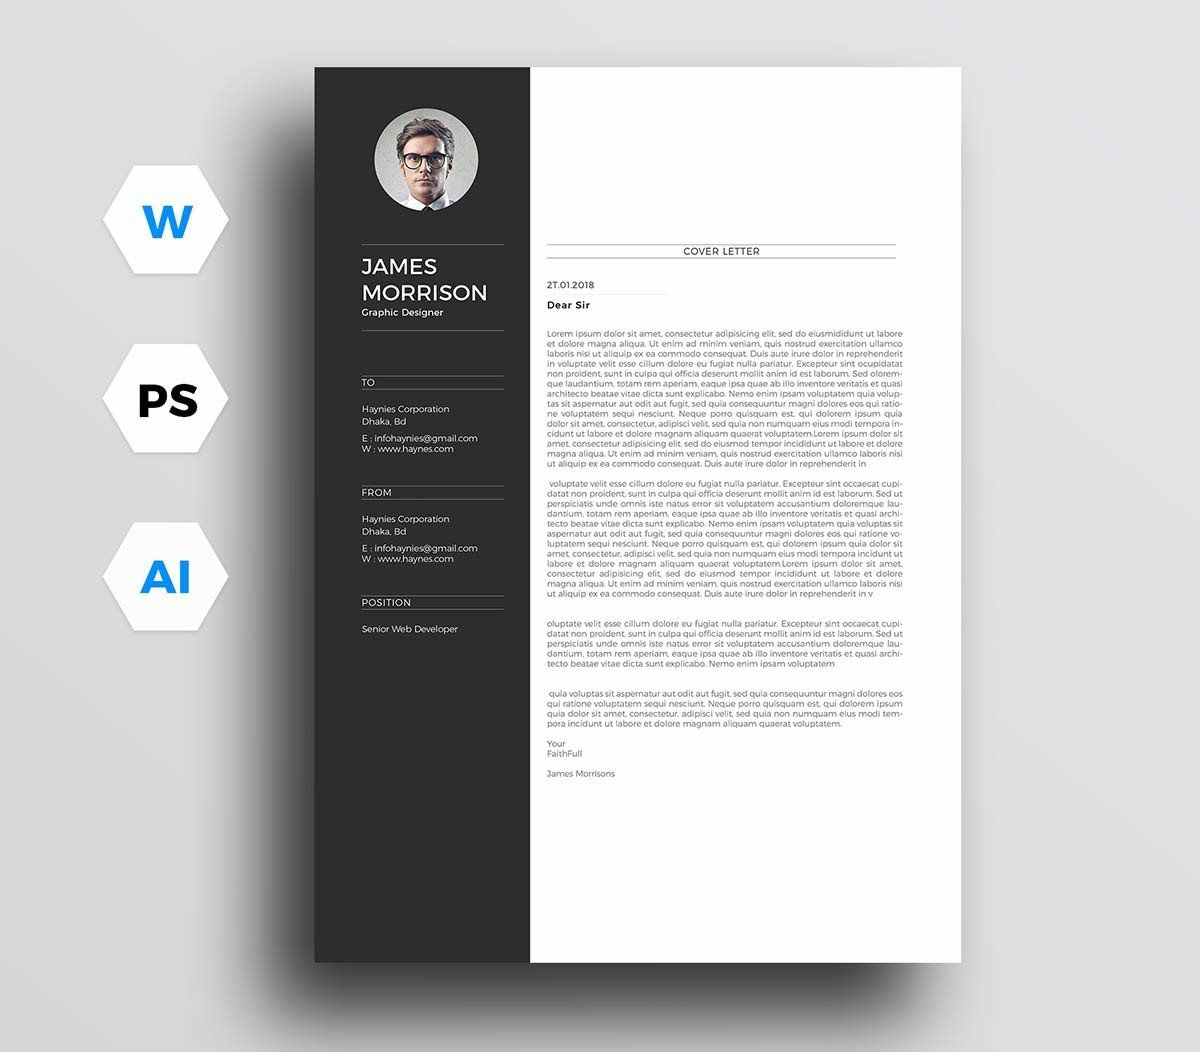 005 Wonderful Cover Letter Template Office Online Idea  MicrosoftFull